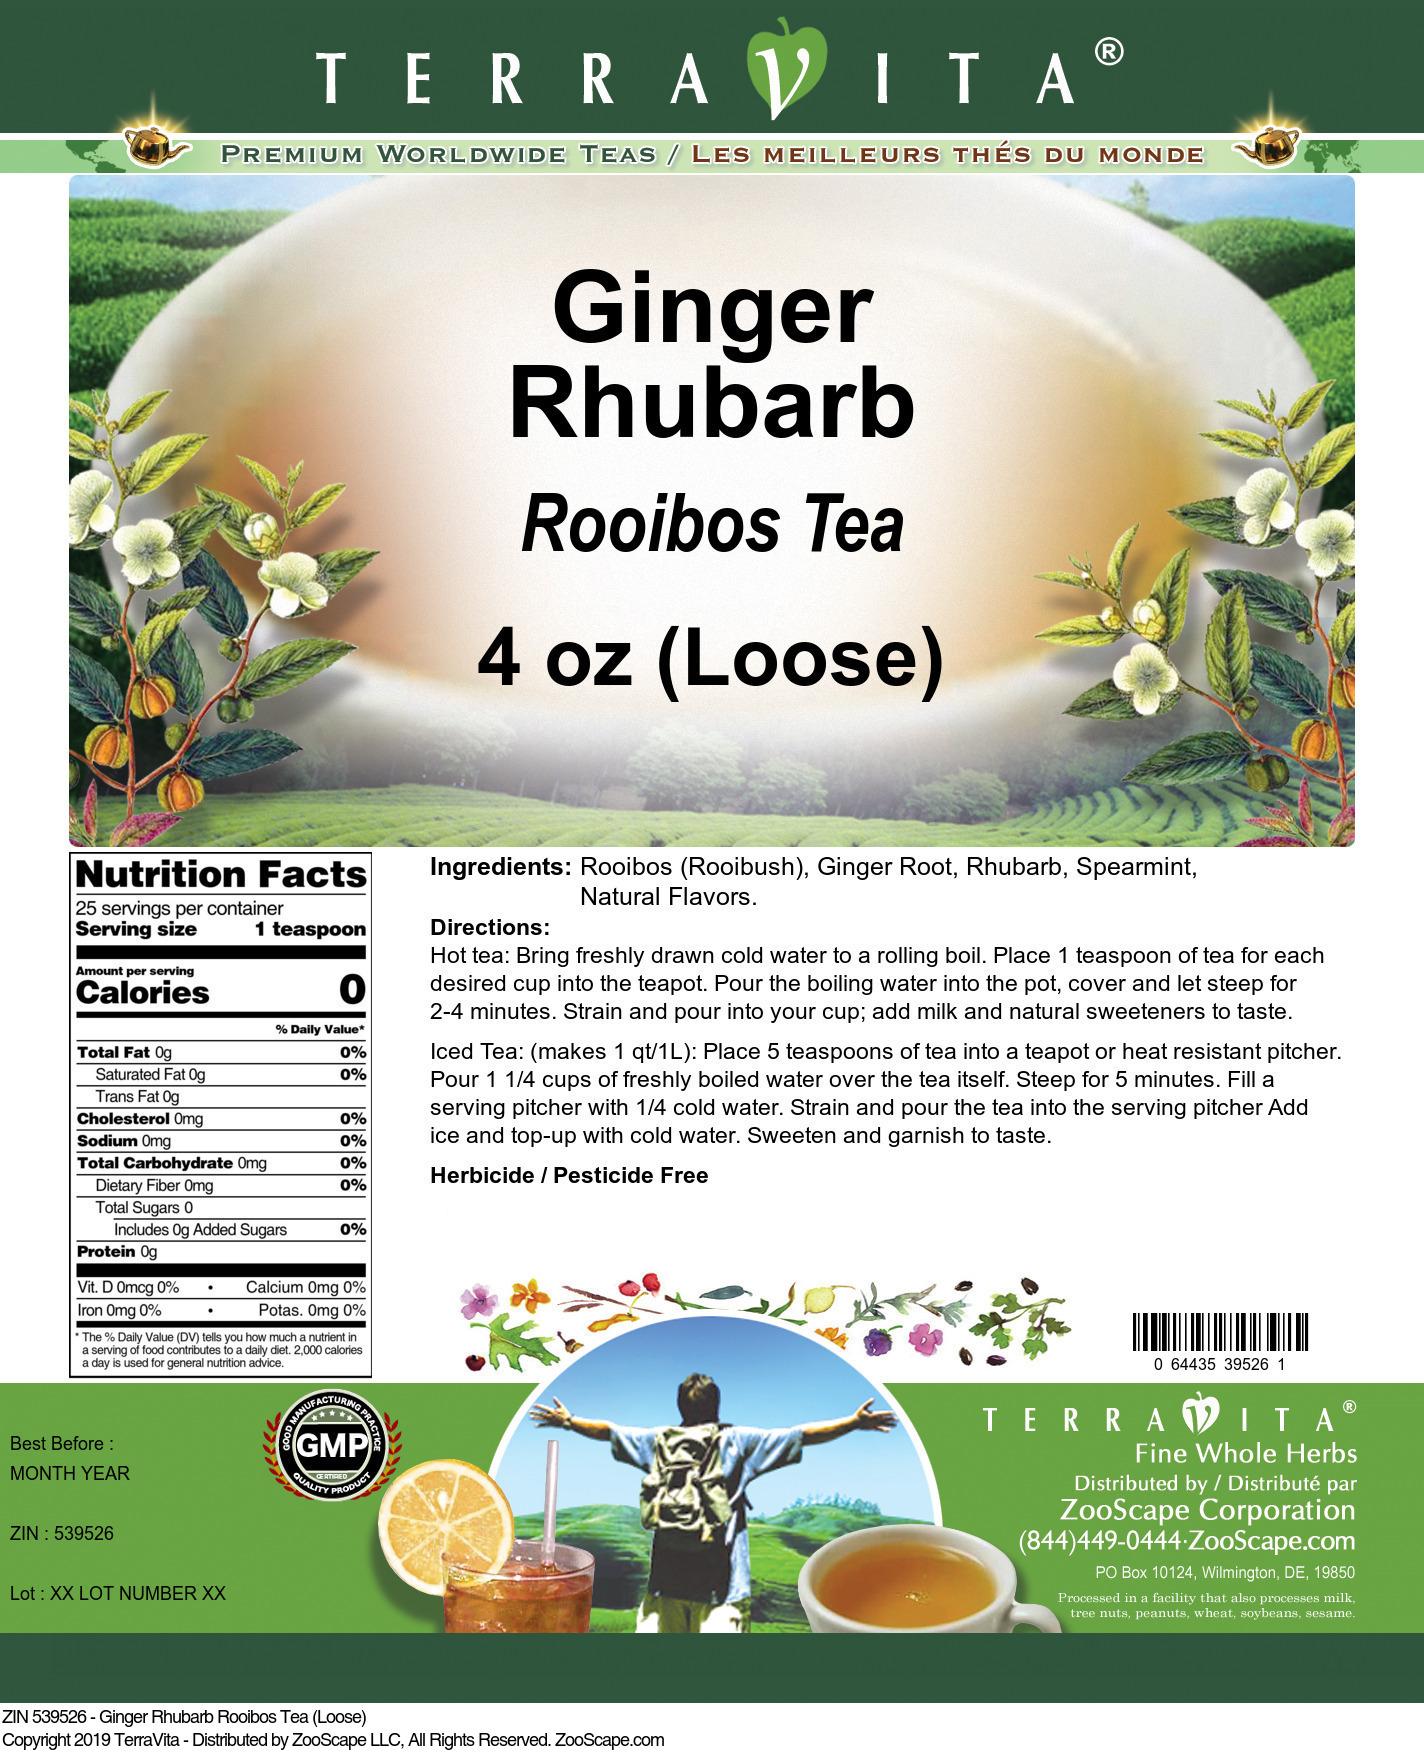 Ginger Rhubarb Rooibos Tea (Loose)